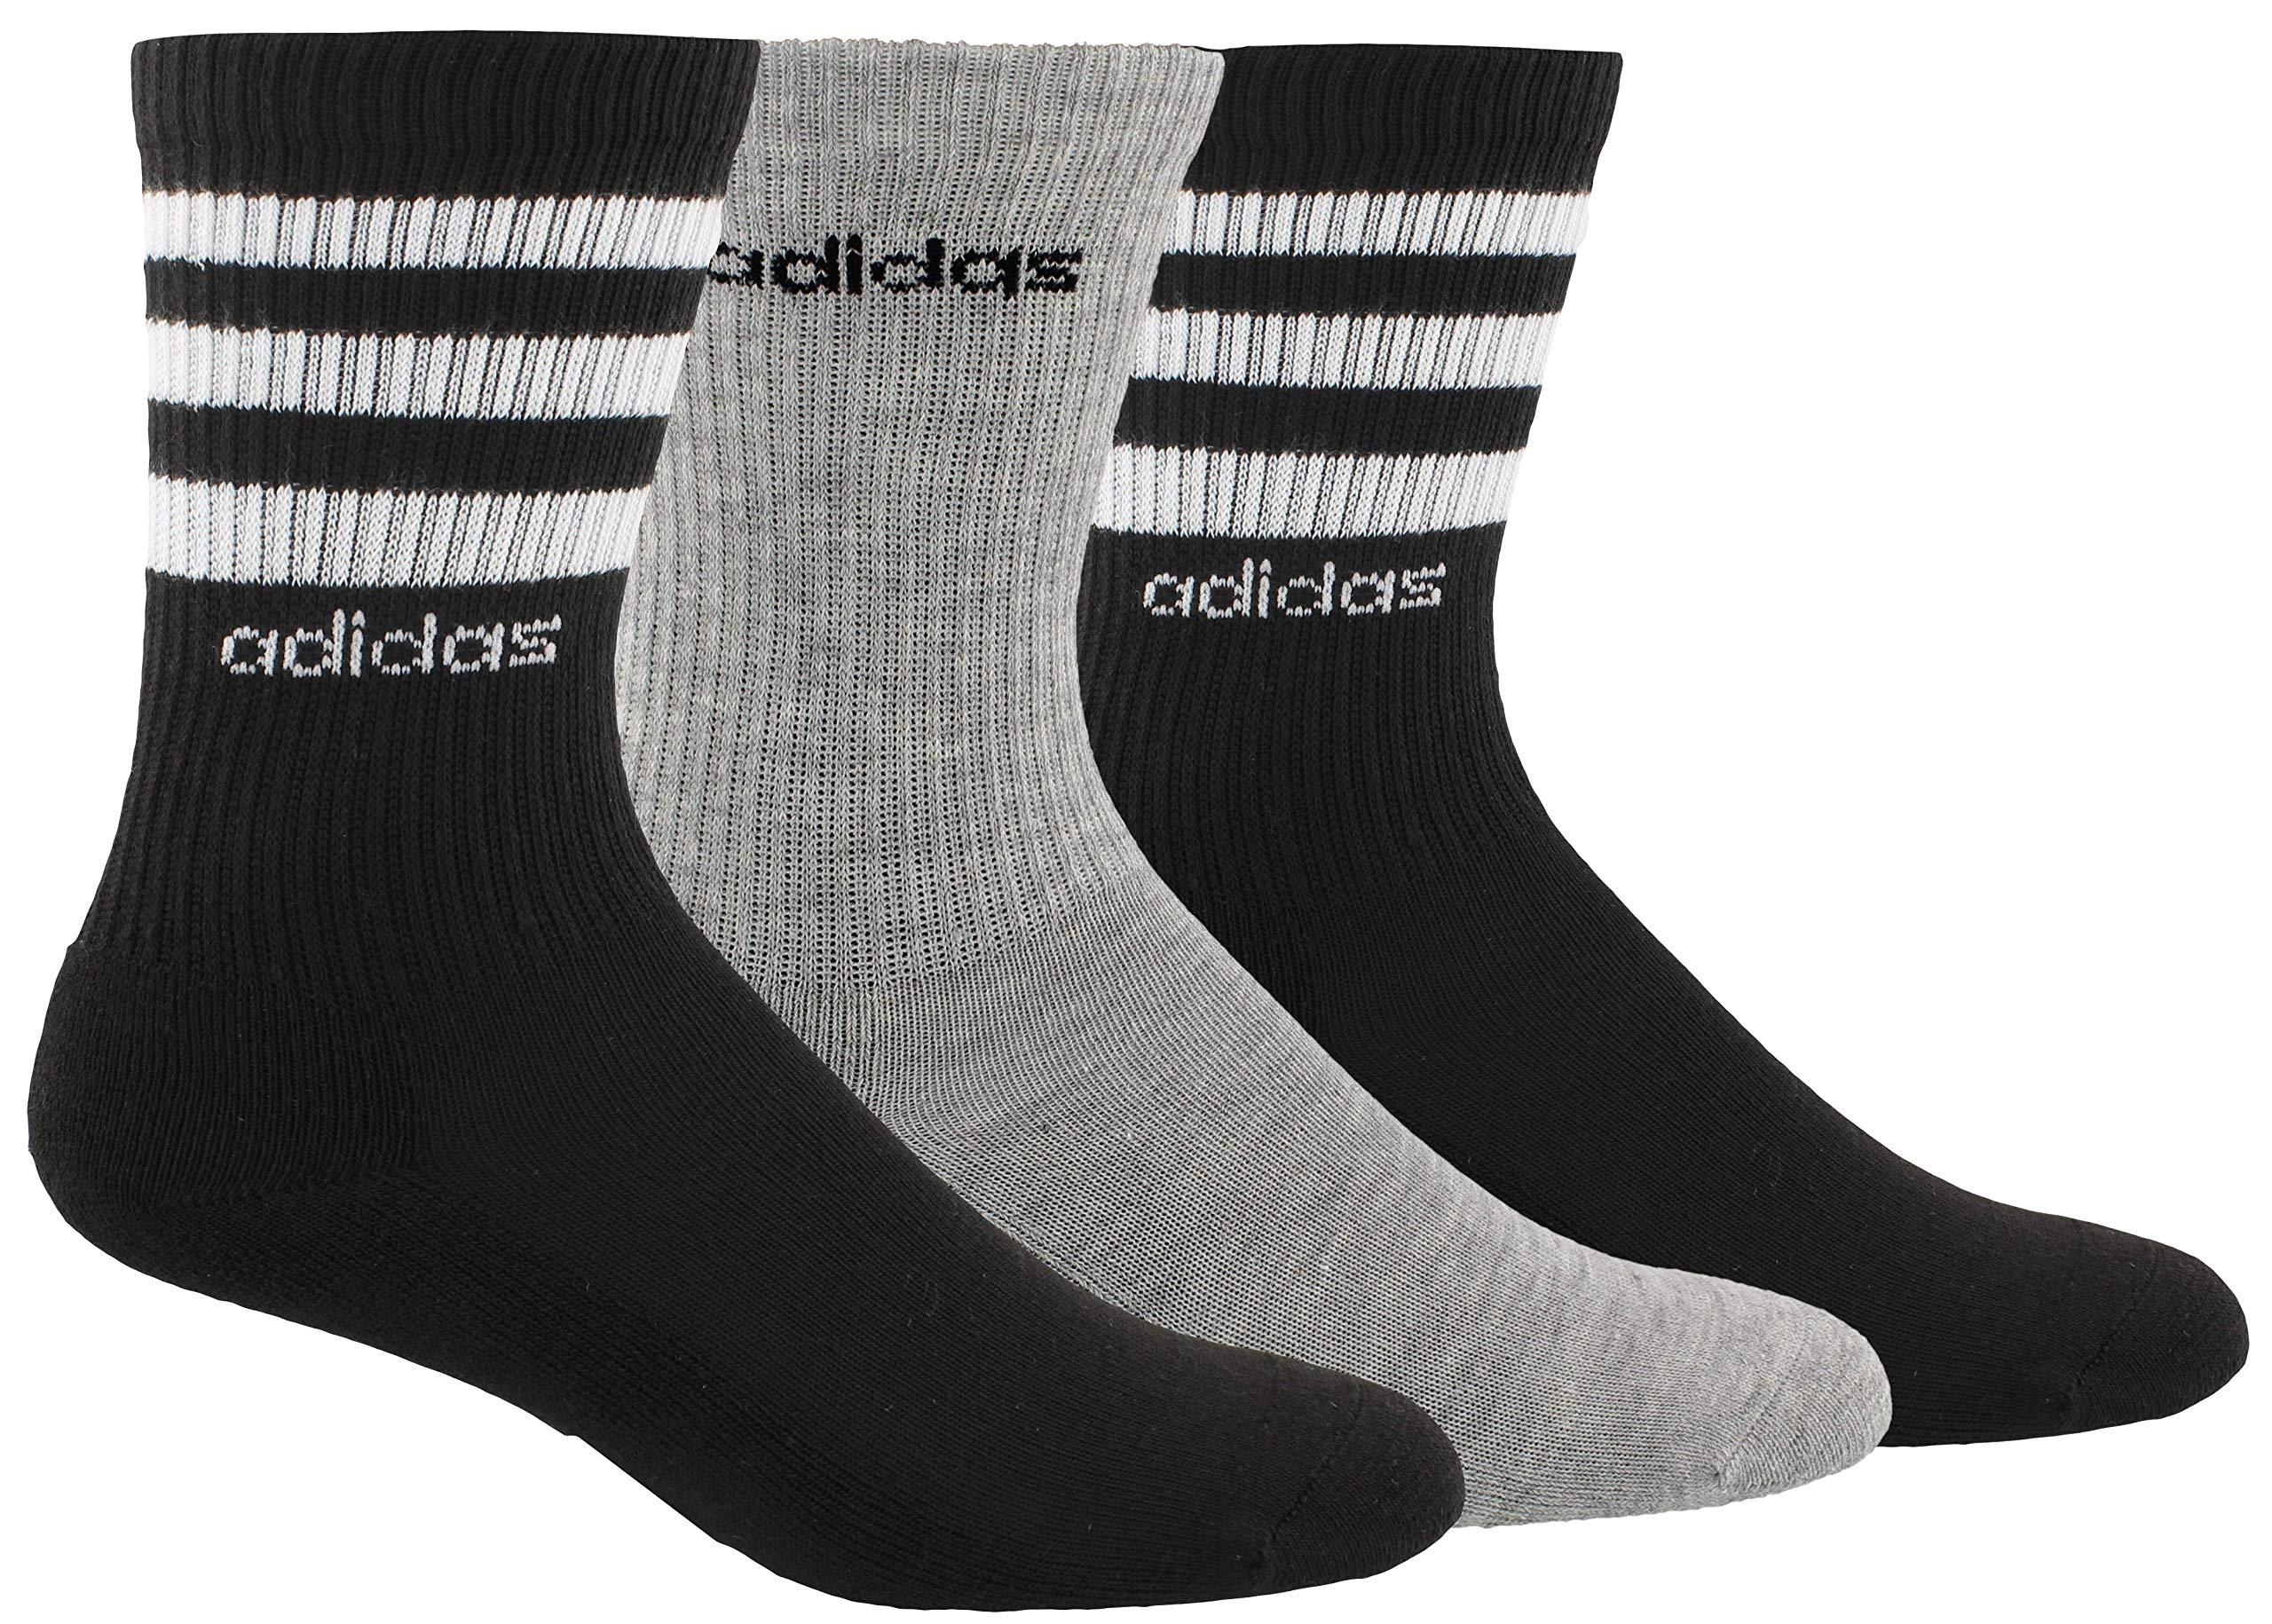 adidas Women's 3-Stripe Crew Socks (3-Pair), Black/White/Light Heather Grey, Medium, (Shoe Size 5-10) by adidas